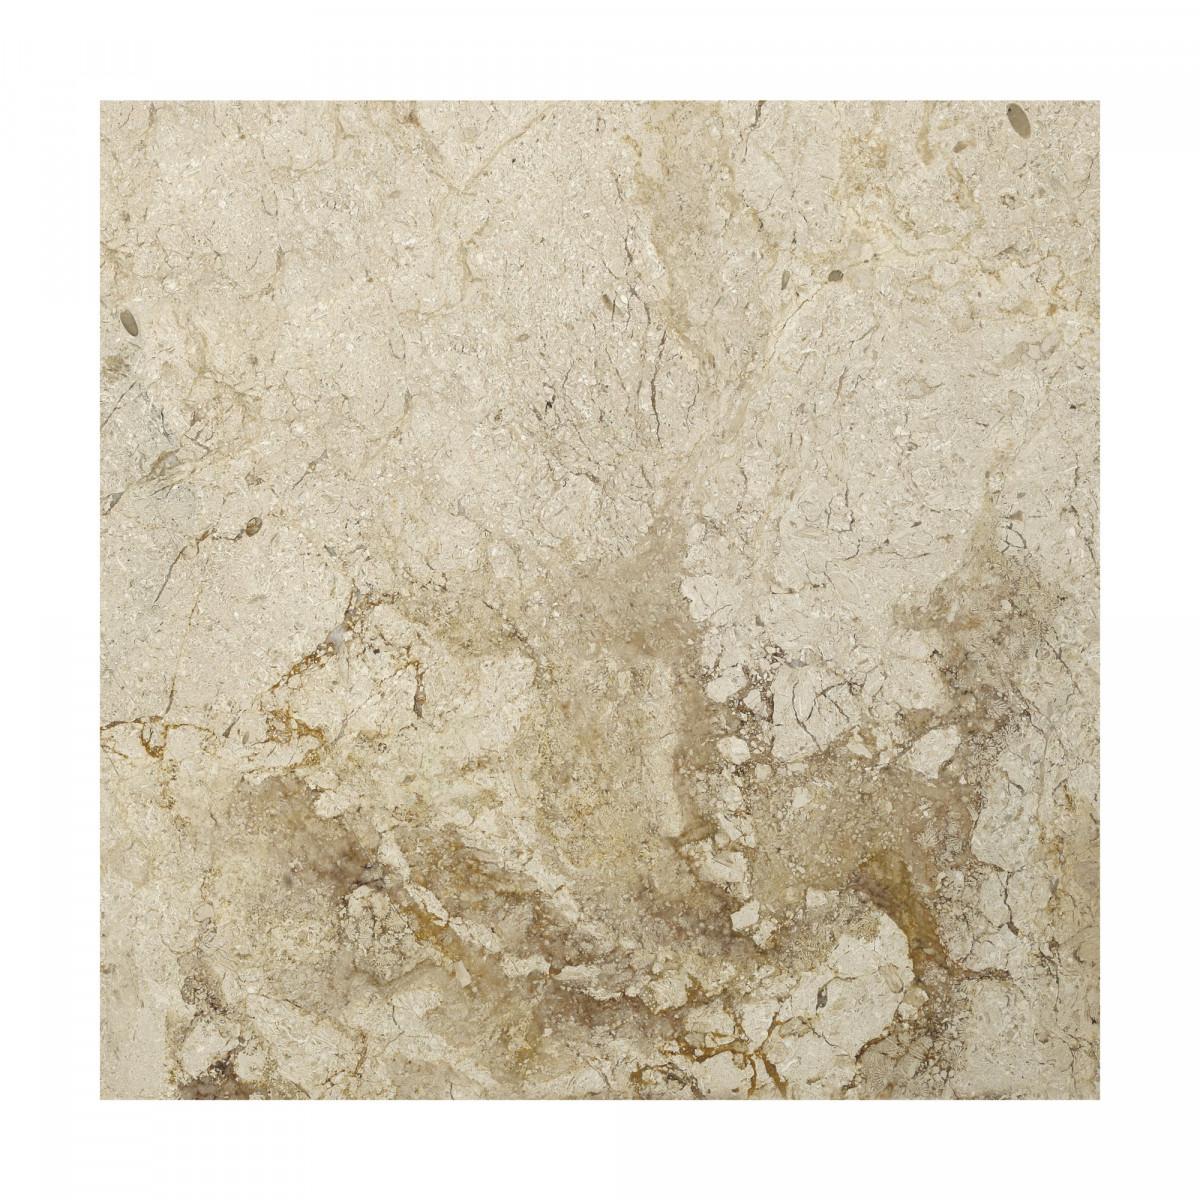 Stone Floor Tiles   Buy Natural Stone Tiles Online   British ...